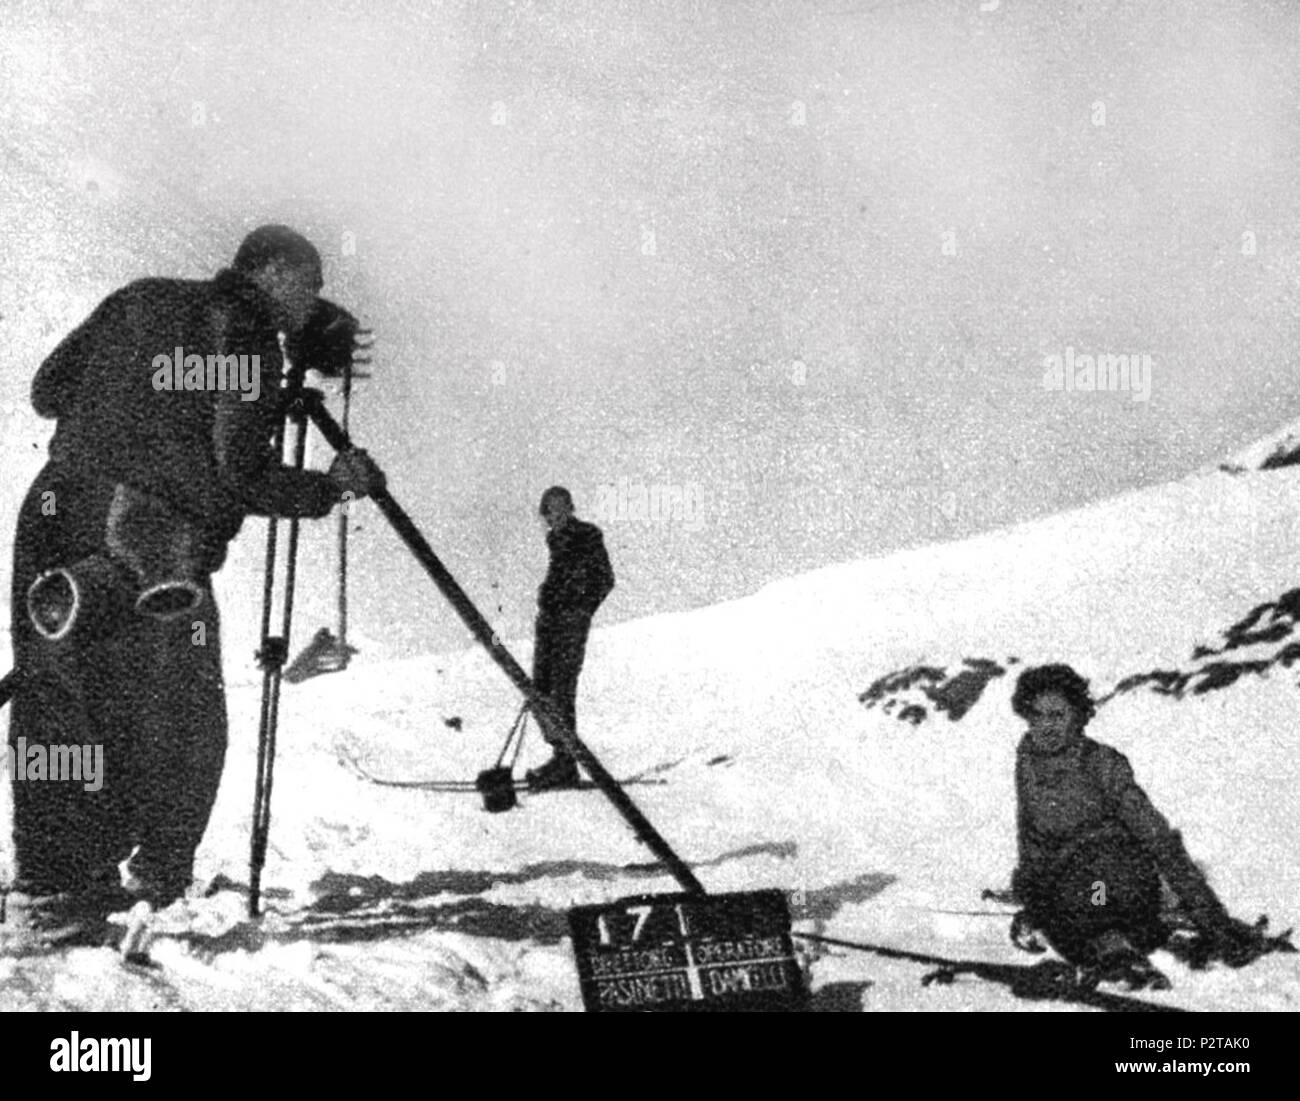 Documentario ENTUSIASMO entusiasmo Pasinetti 1933 25-sigira-1933 Imagen De Stock